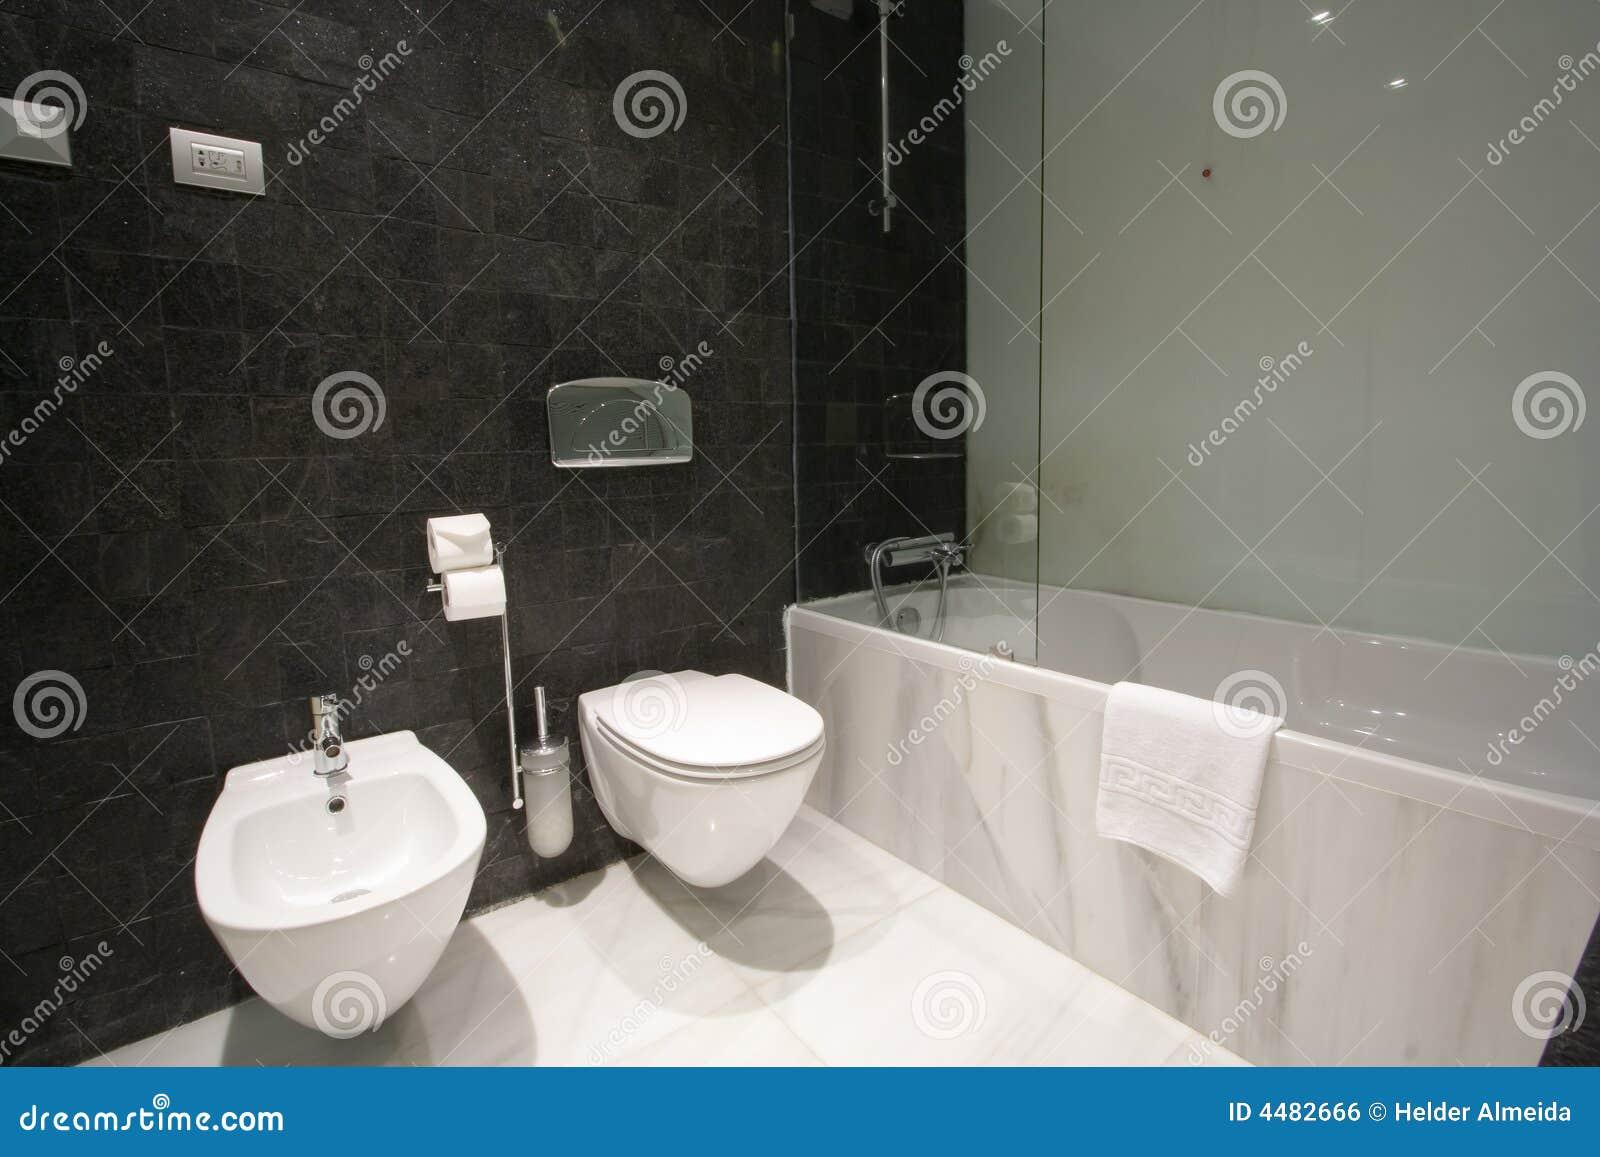 Fancy bathrooms pictures